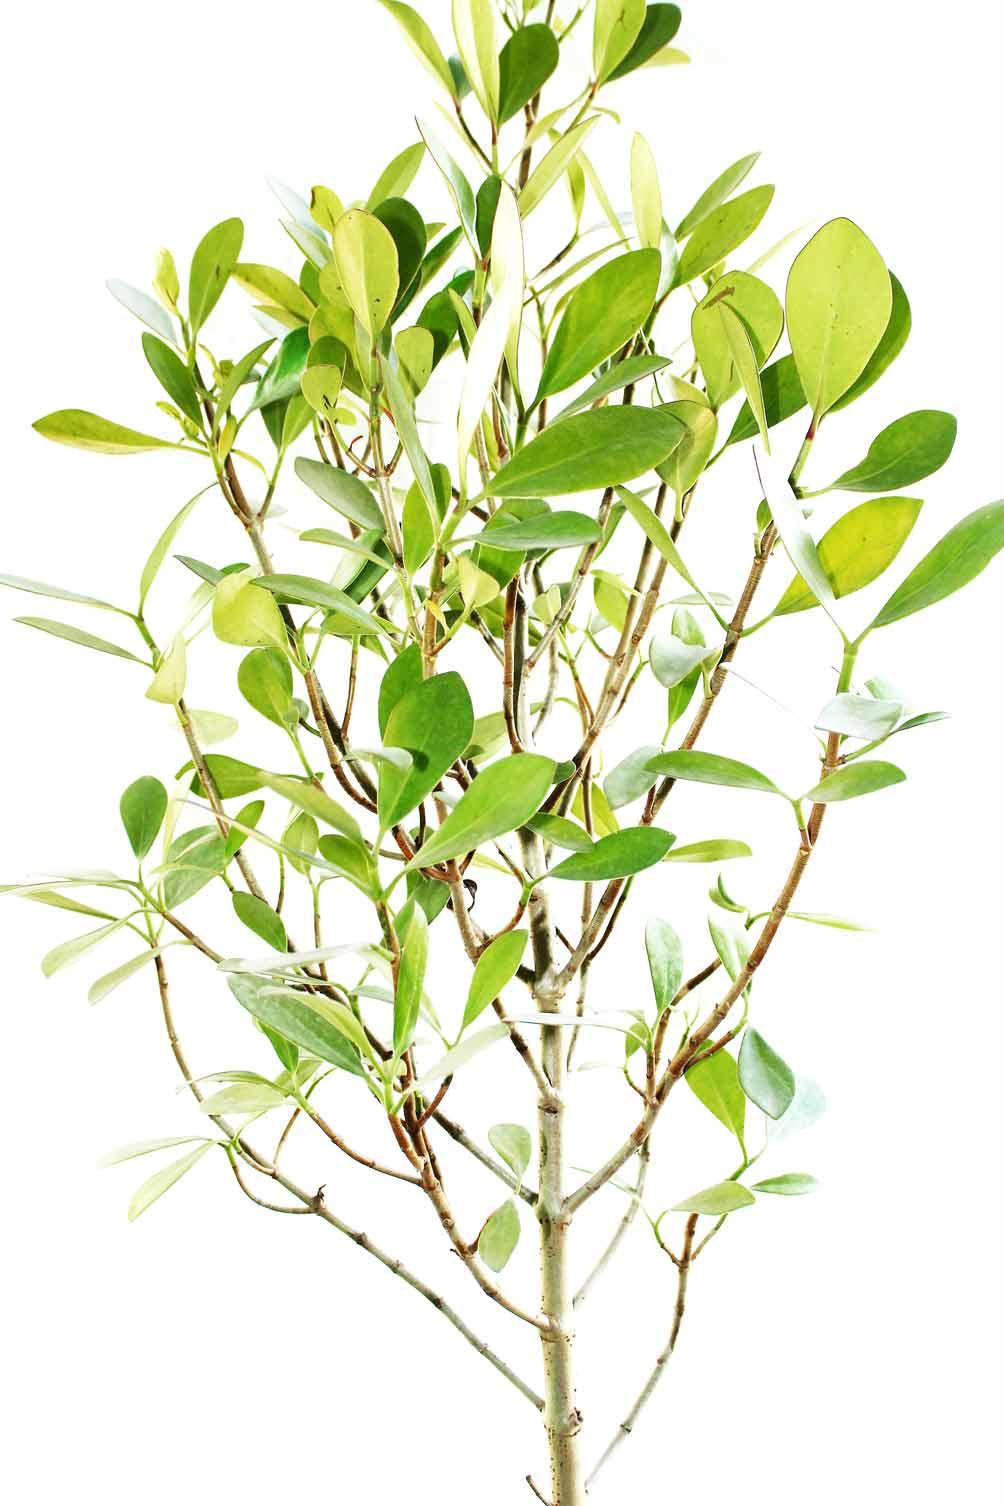 Best Plants For Living Room Part - 45: ... Best Plants For Living Room By Living Room Plants India Best Livingroom  2017 ...